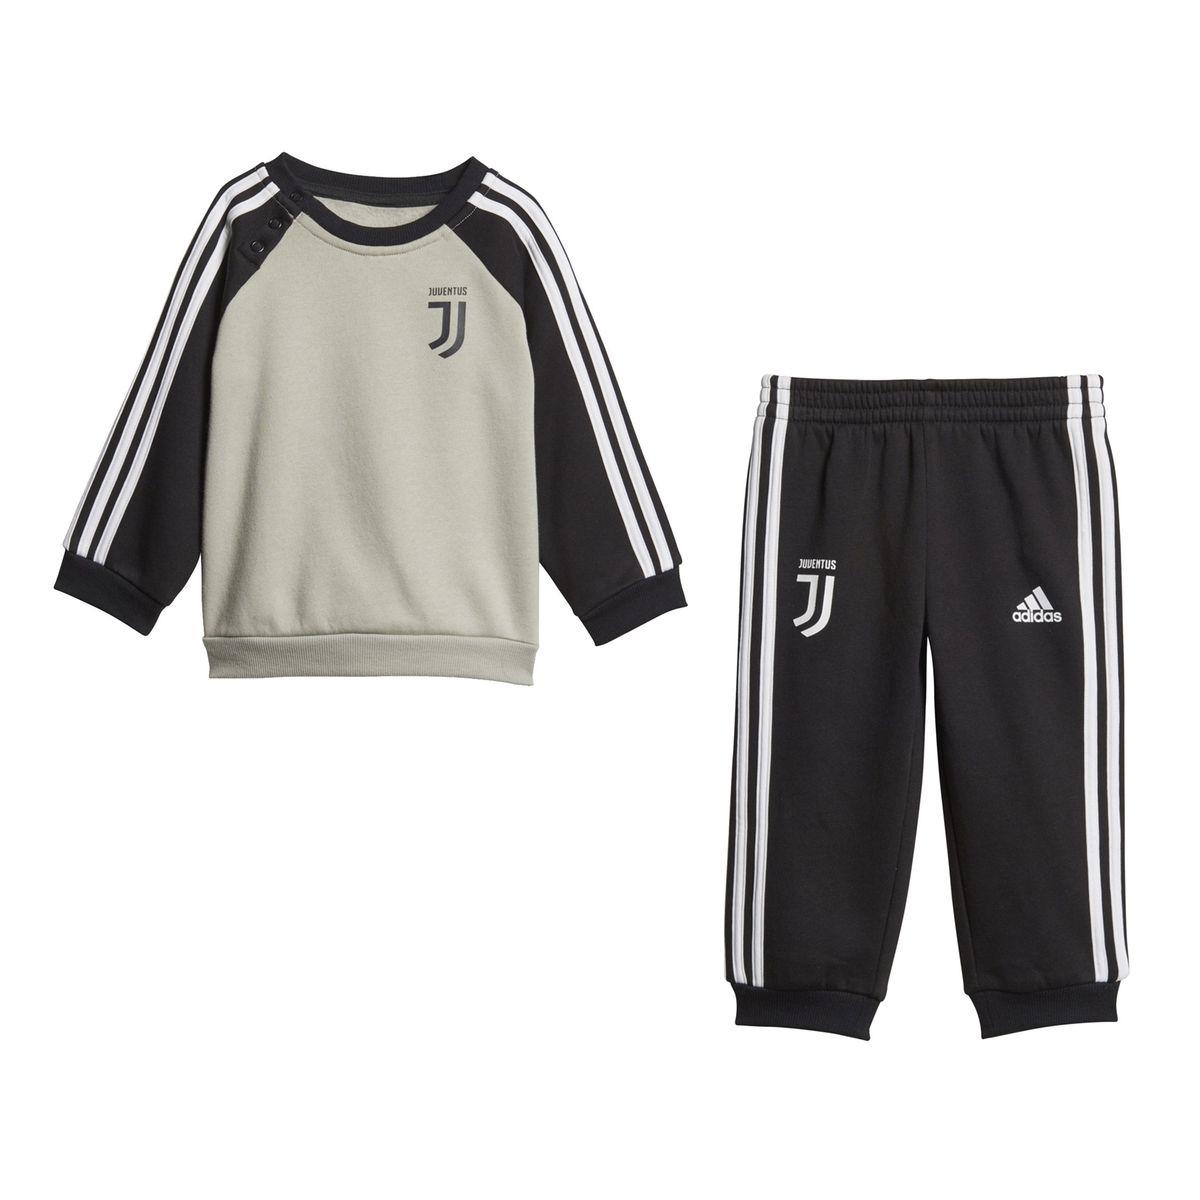 En JuventusPantalon Juventus 2019Products Jogger Beige Baby rWBdxoeC